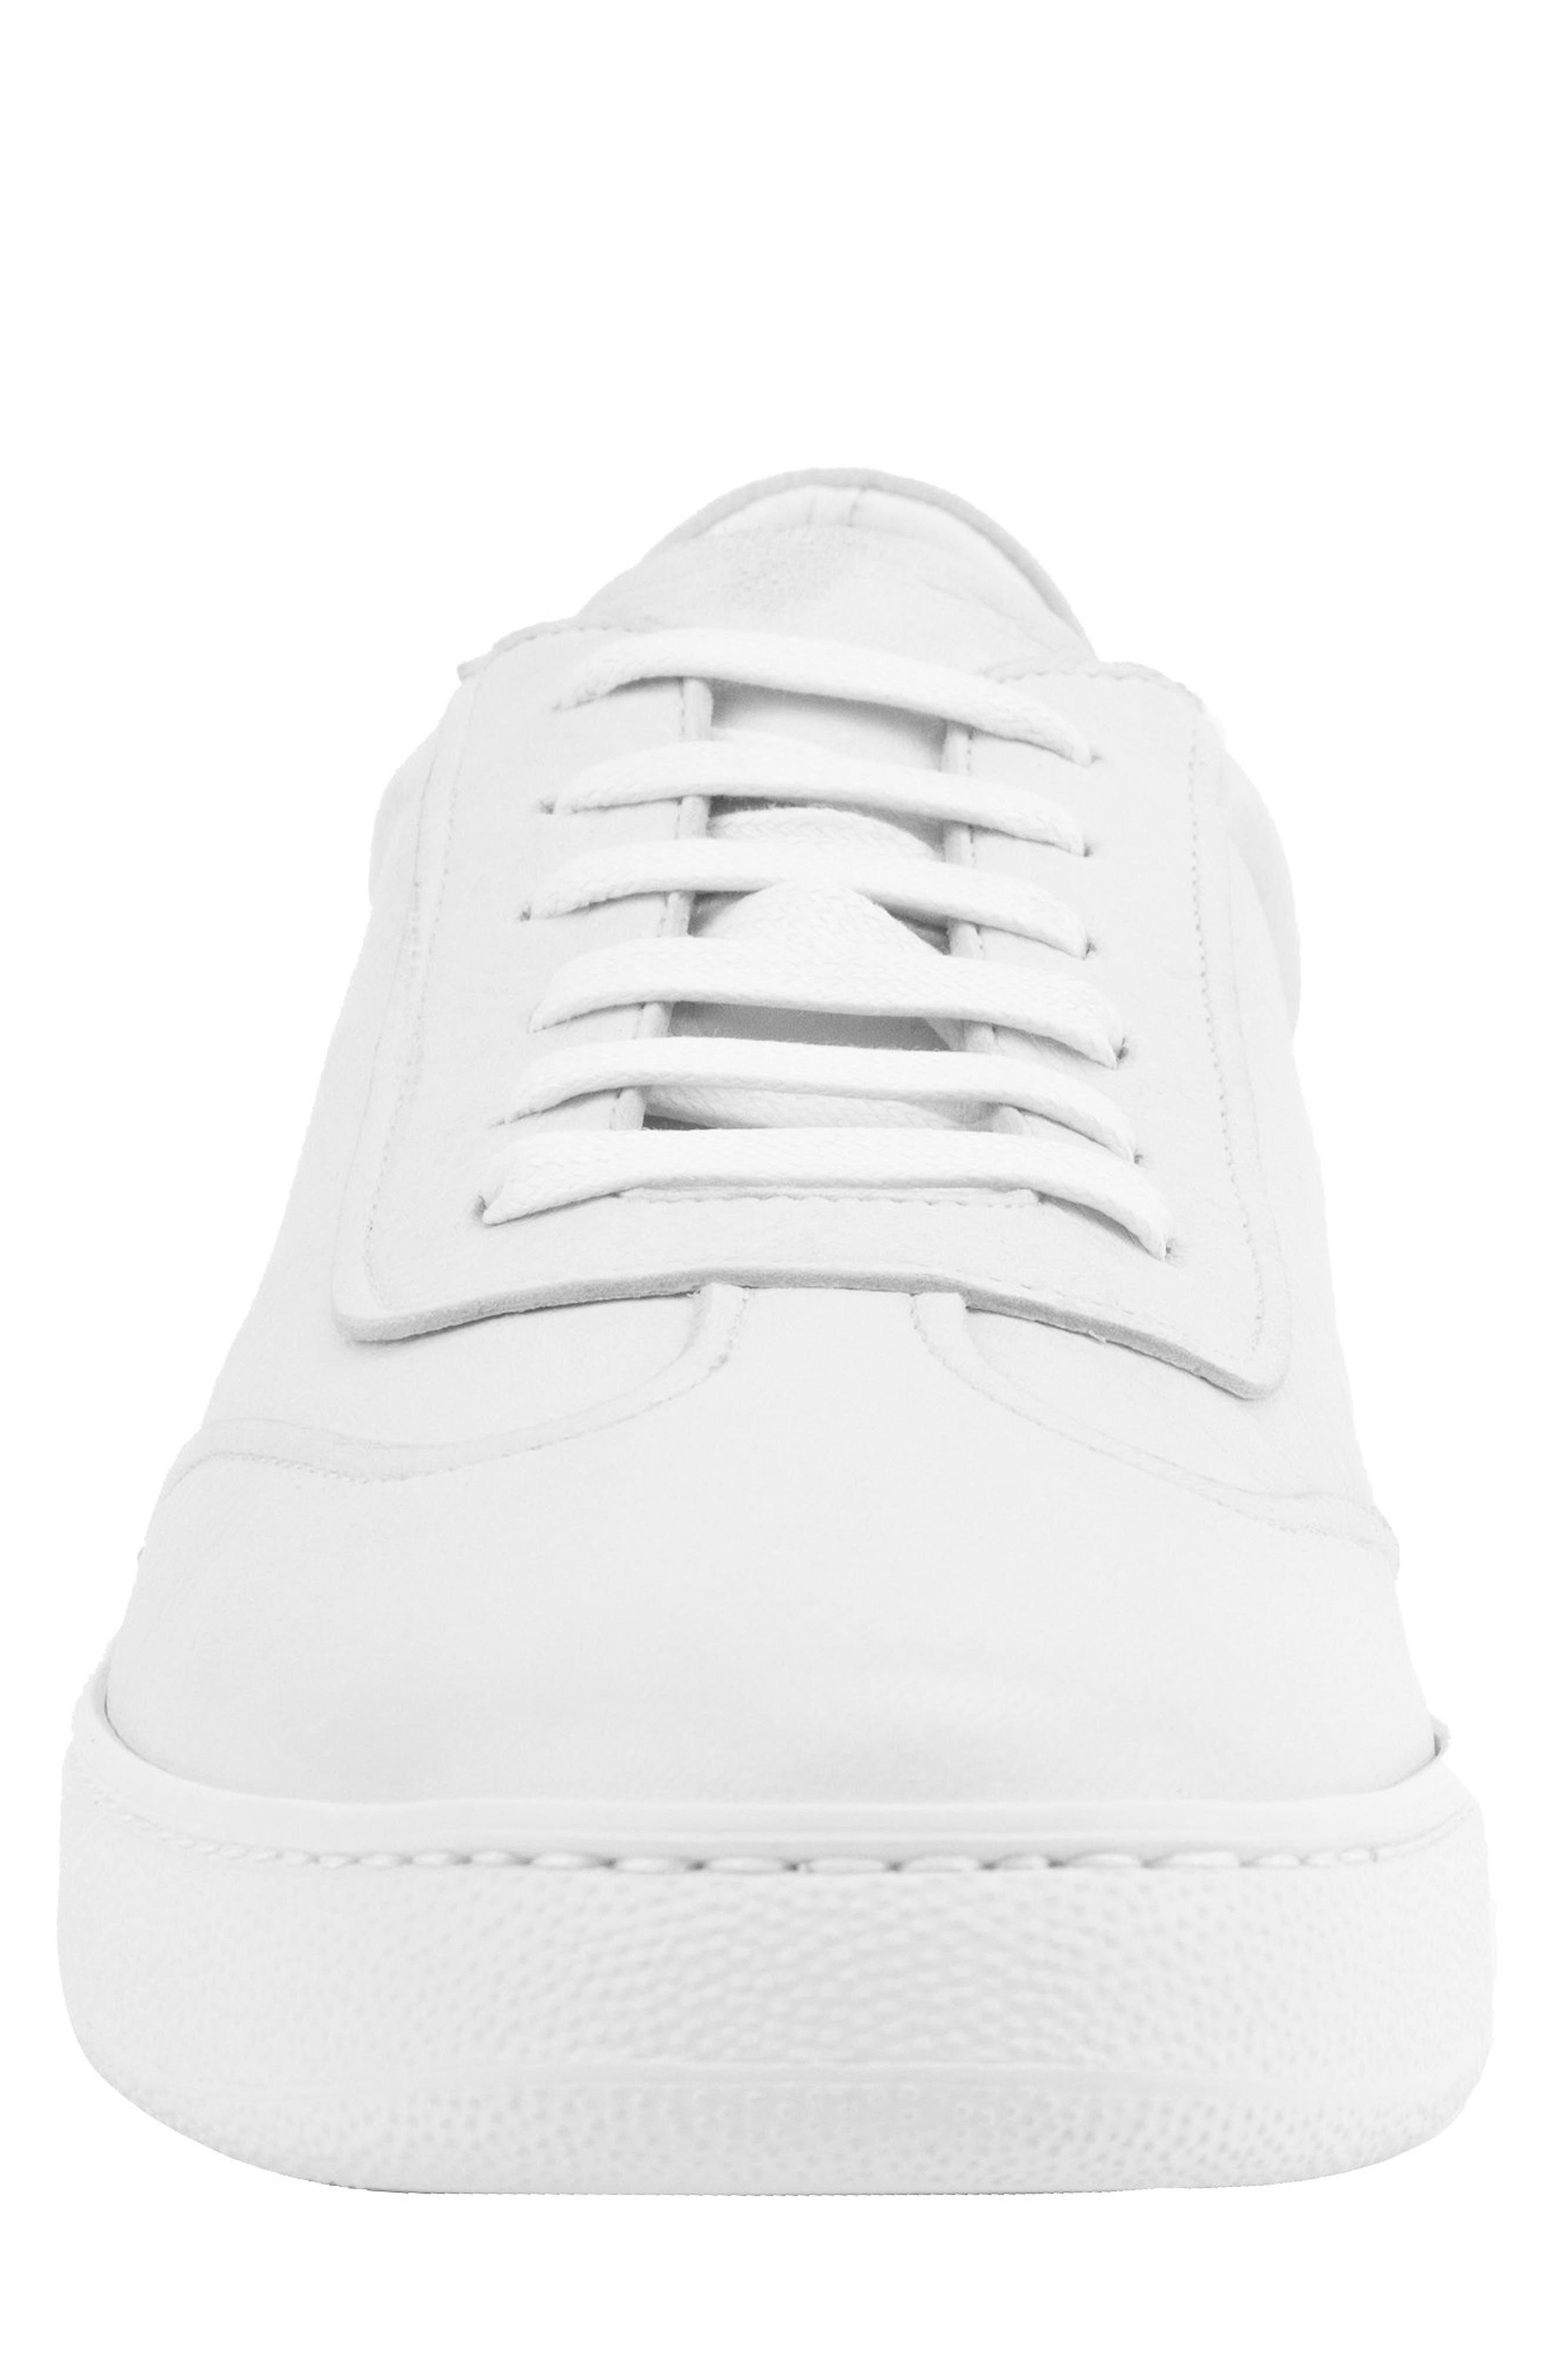 Tristan Sneaker,                             Alternate thumbnail 4, color,                             WHITE LEATHER